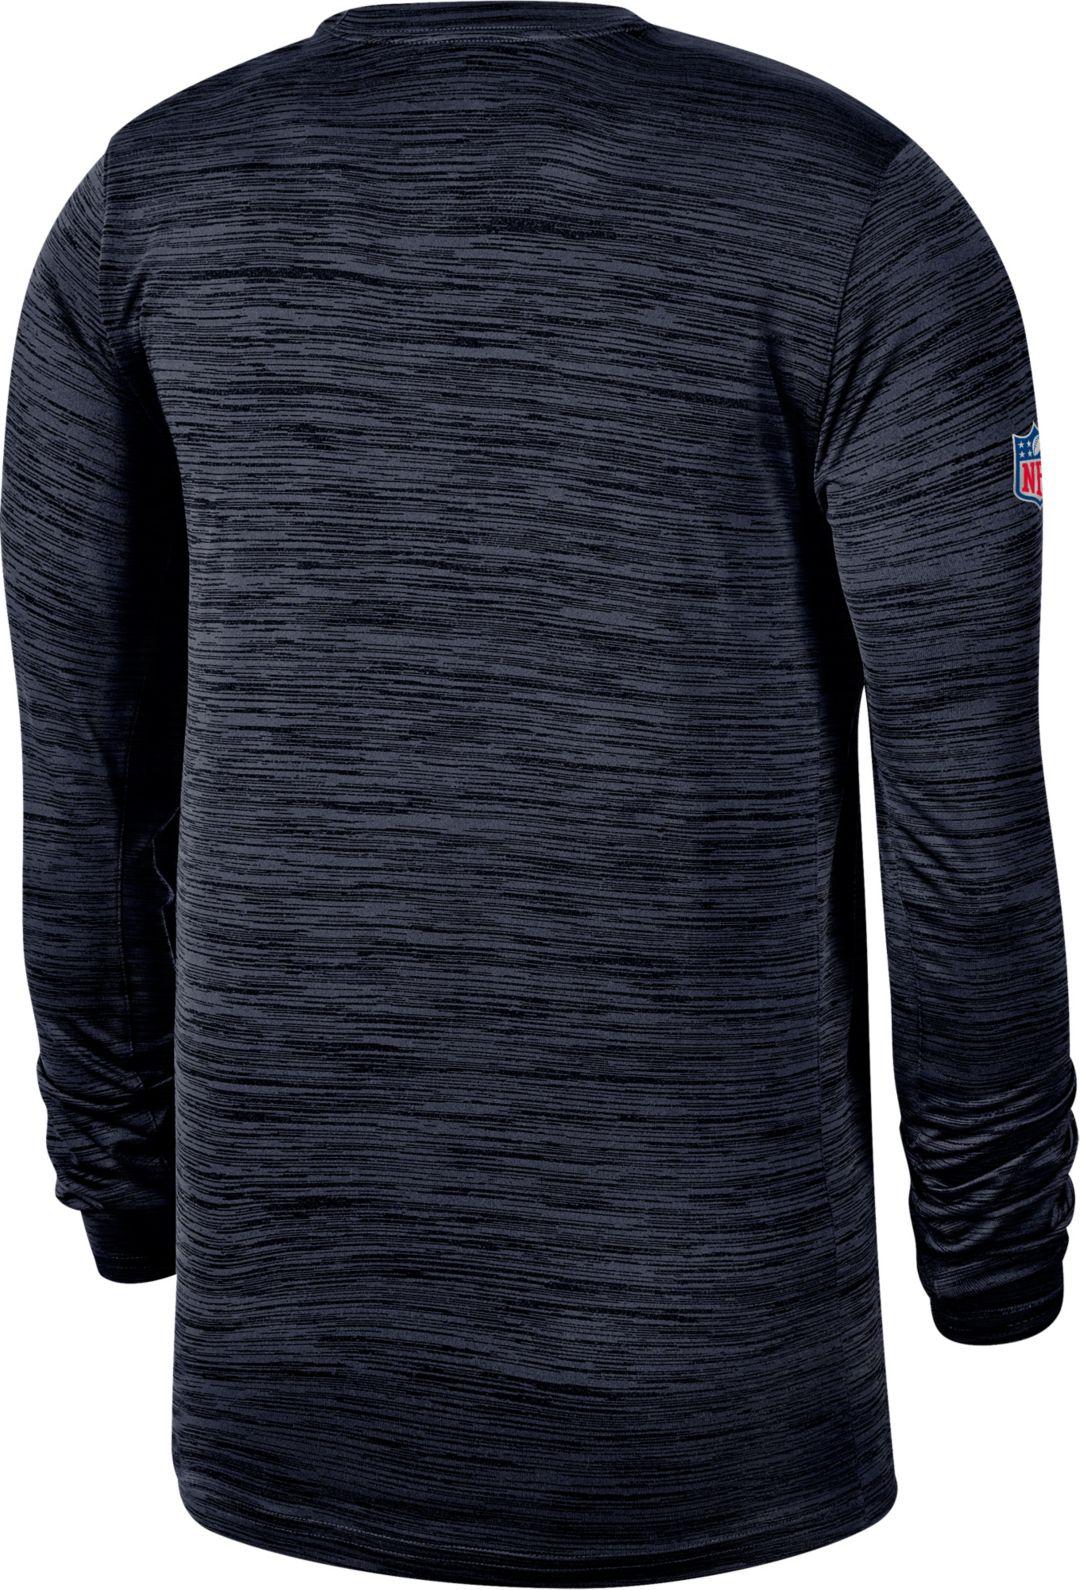 d7ce1b64 Nike Men's Tennessee Titans Sideline Legend Velocity Navy Long Sleeve Shirt